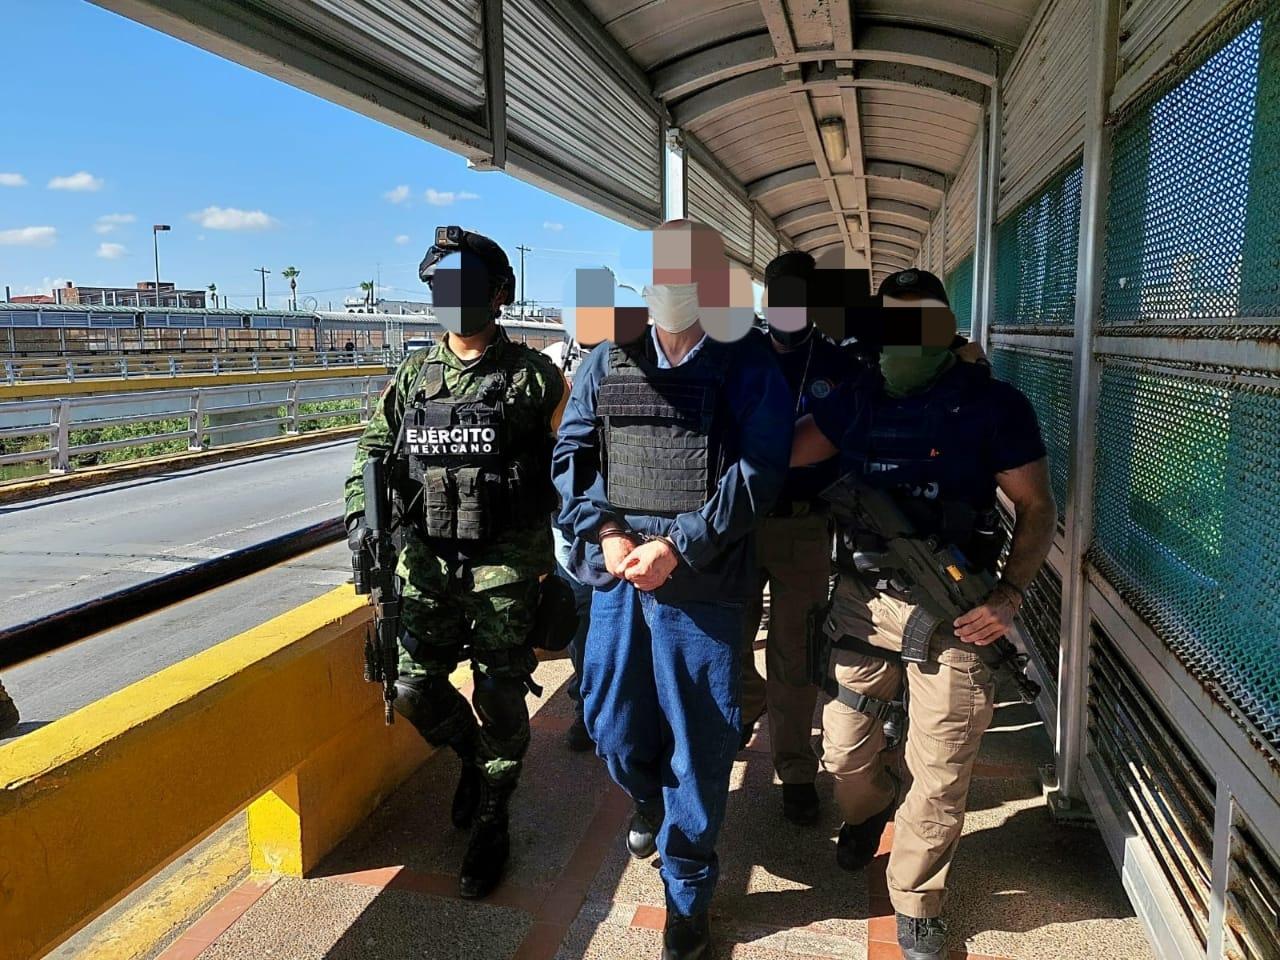 Arellano Félix, exlíder del Cártel de Tijuana, es entregado a México por Autoridades estadounidenses